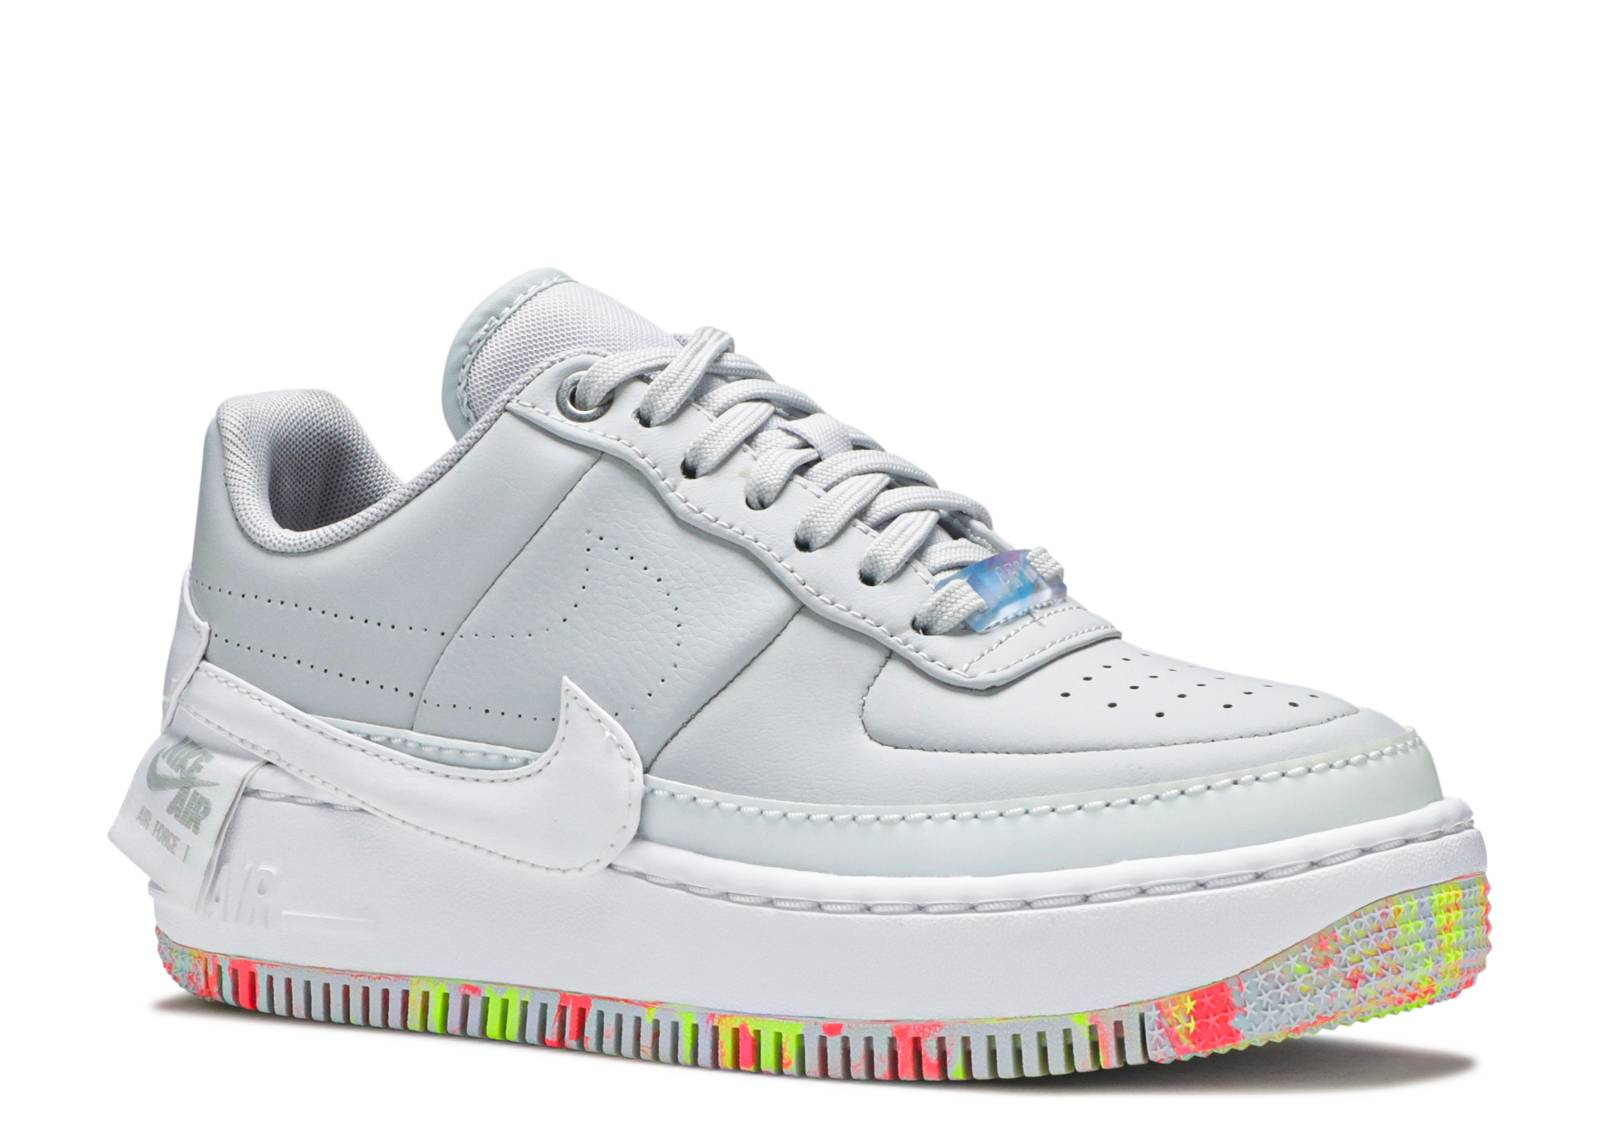 Details zu Mens Nike Air Max 90 Ultra 2.0 JCRD BR 898008 600 RedWhite Sizes: UK 7.5_9